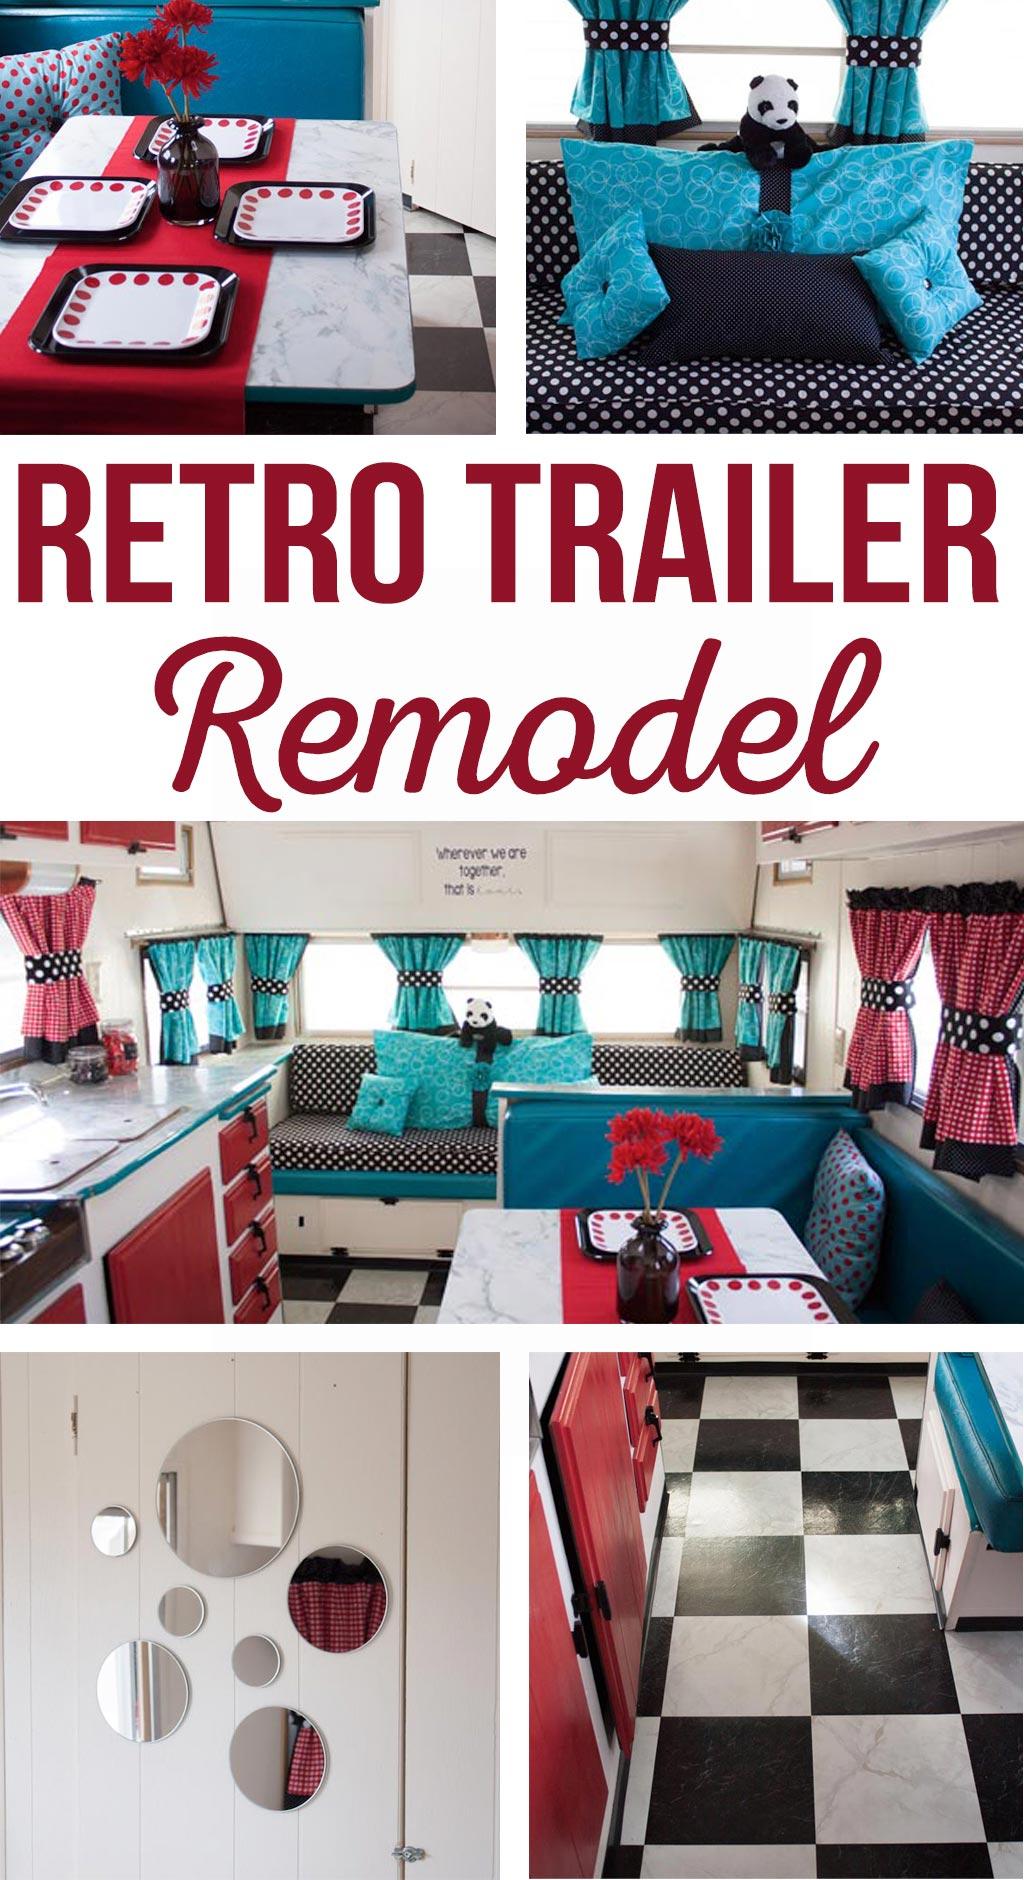 Vintage Trailer Remodel - Retro Trailer - This is SO cute! Love this glamper!! Retro Trailer Remodel